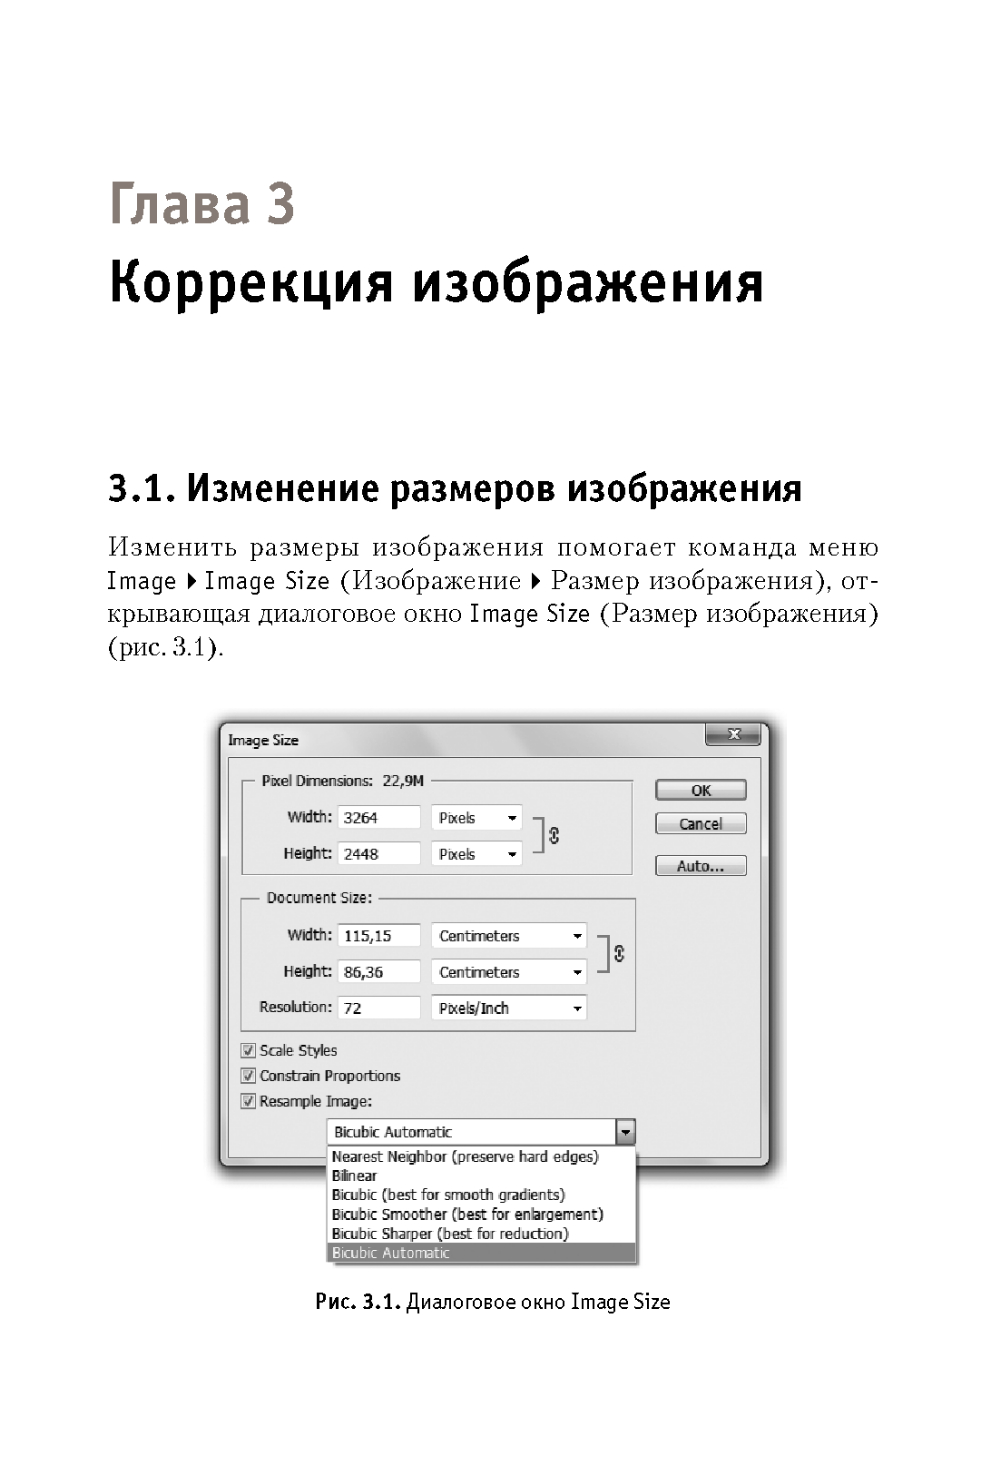 http://i6.imageban.ru/out/2013/11/10/7a3647f5be1ae8afe5ccbf8e4644120e.jpg